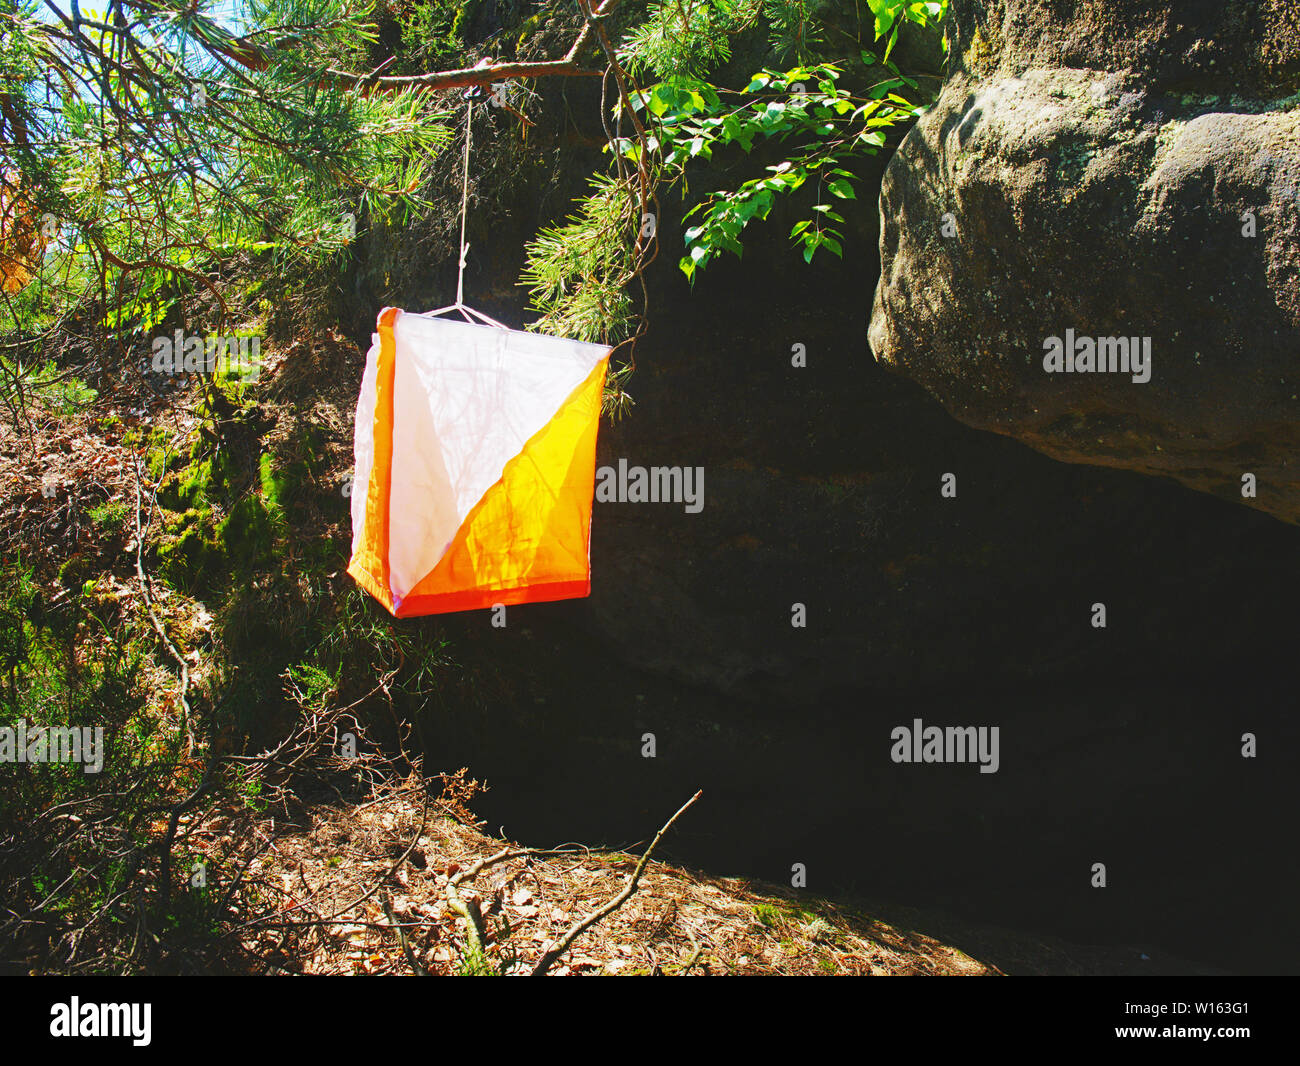 Orienteering orange white box outdoor in a forest. Popular sport activities in nature range - Stock Image